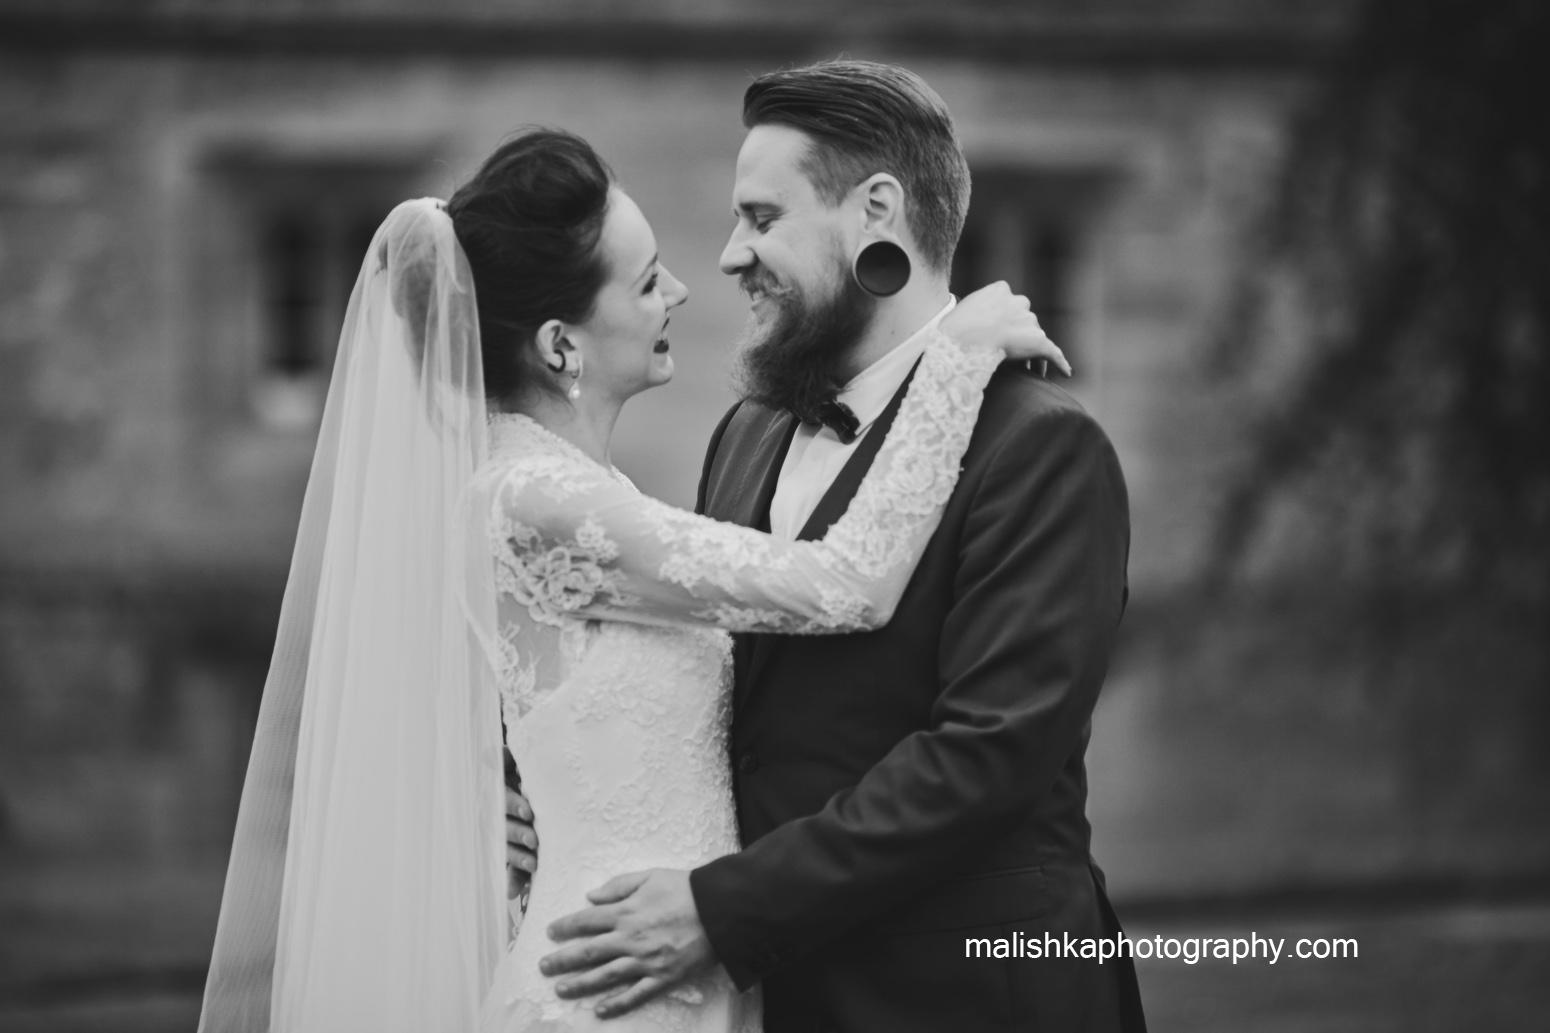 Dalhousie Castle wedding images